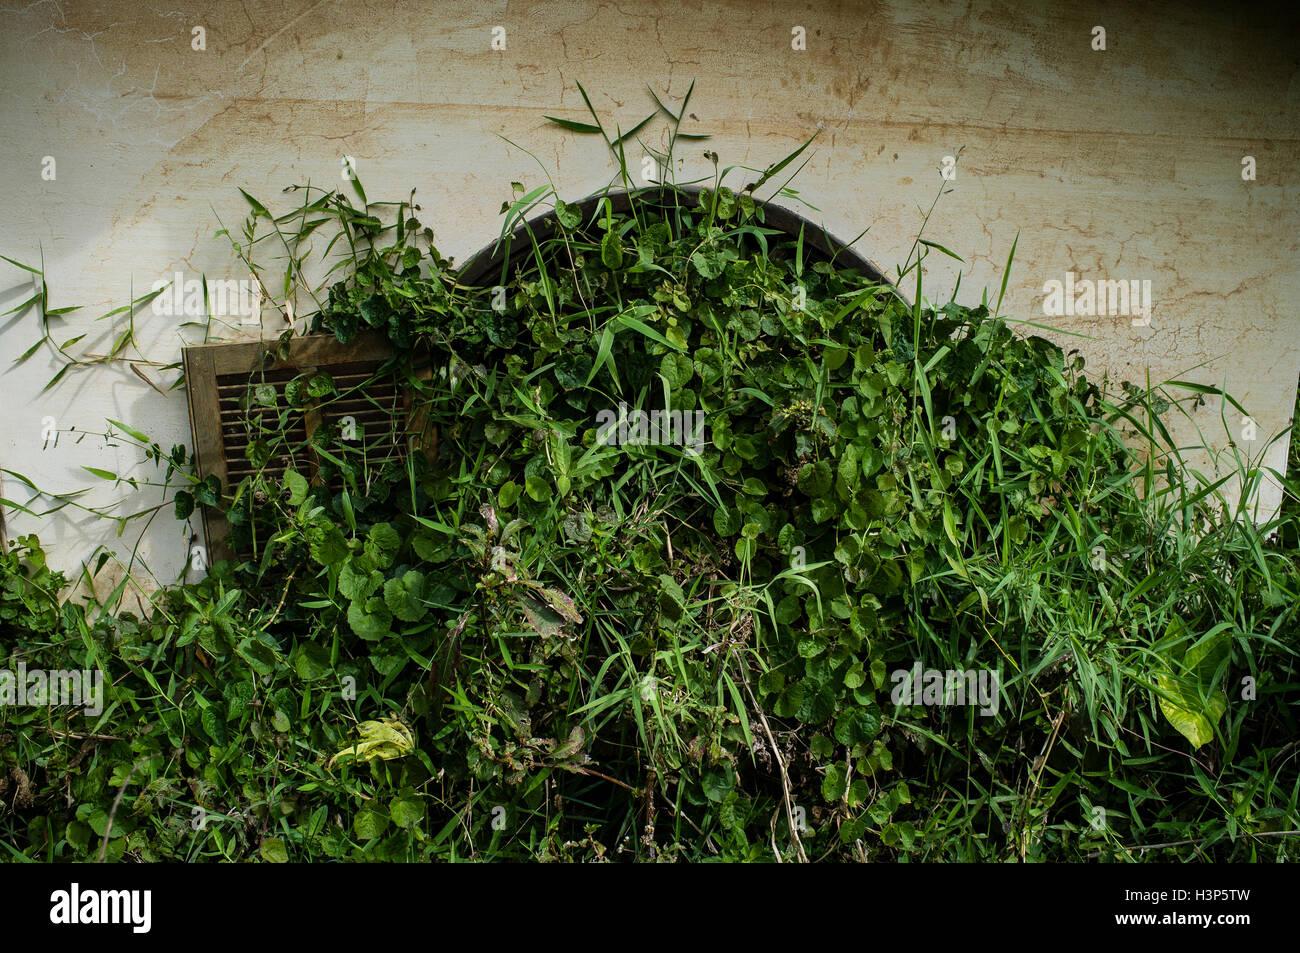 Abandoned house after natural disaster, Nova Friburgo, Rio de Janeiro State, Brazil. - Stock Image